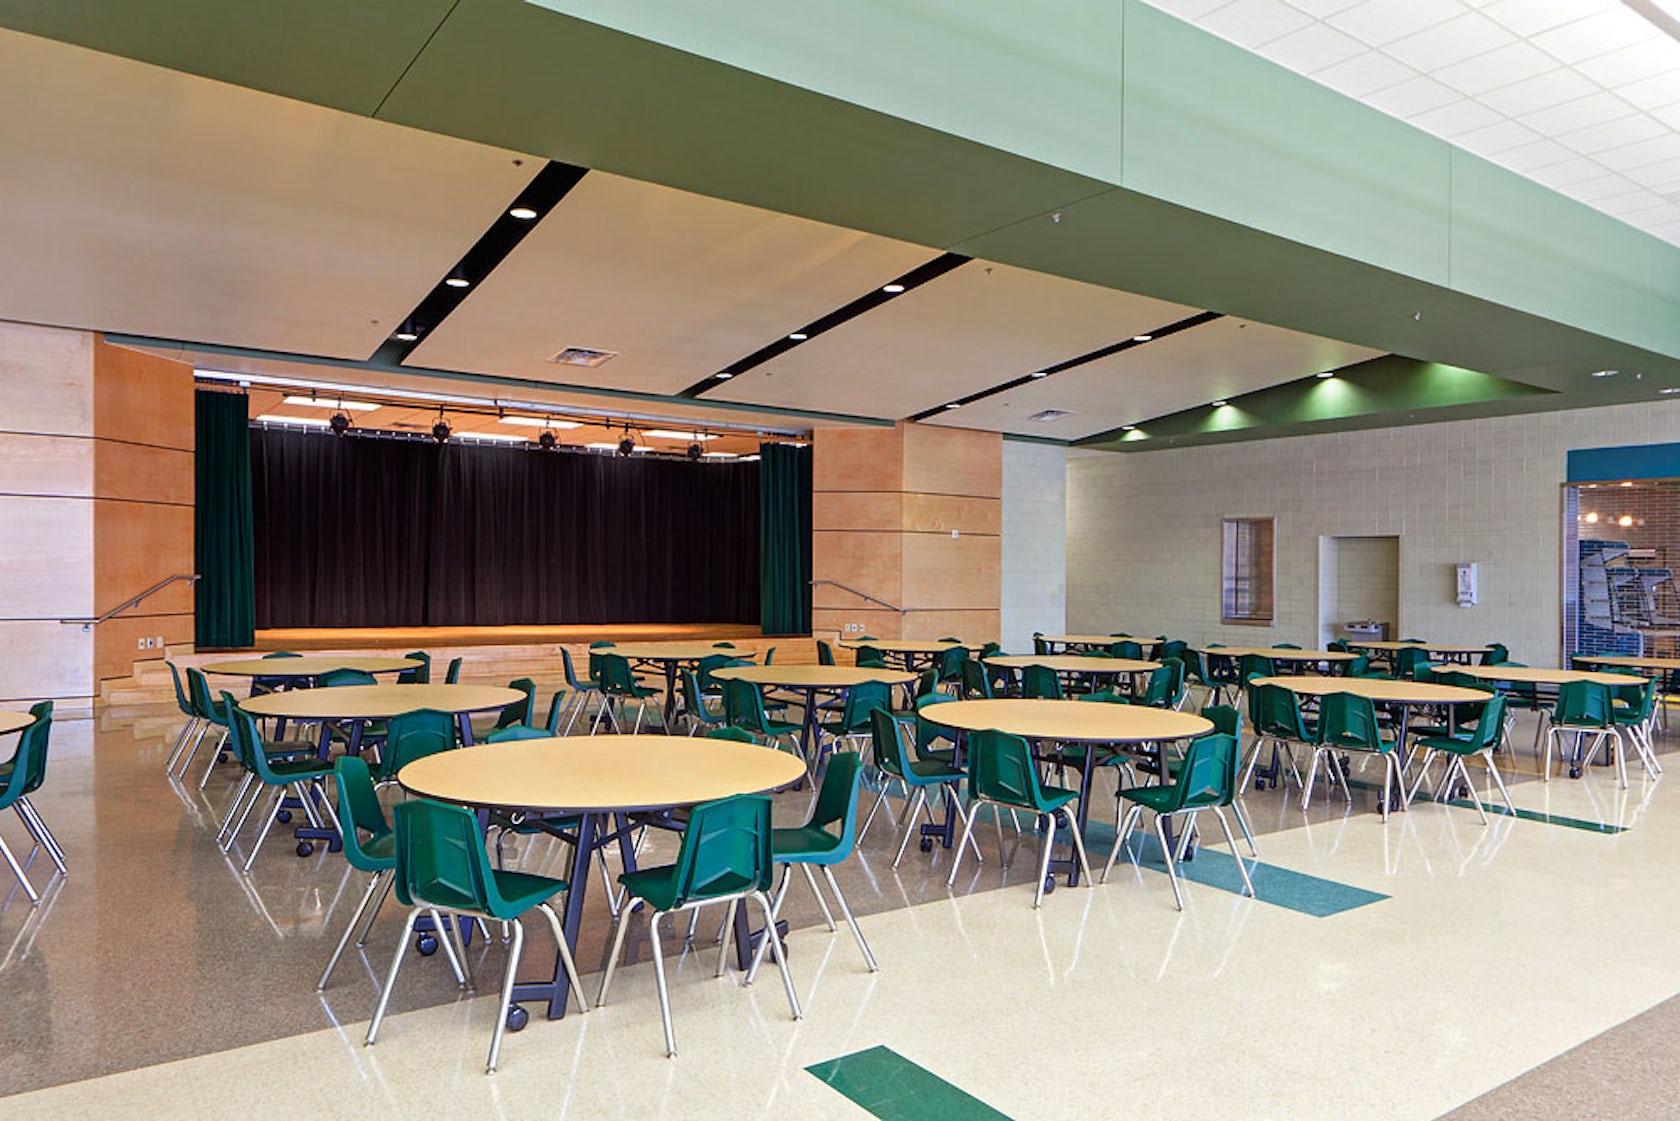 Benbrook middle school architizer - Interior design schools in texas ...